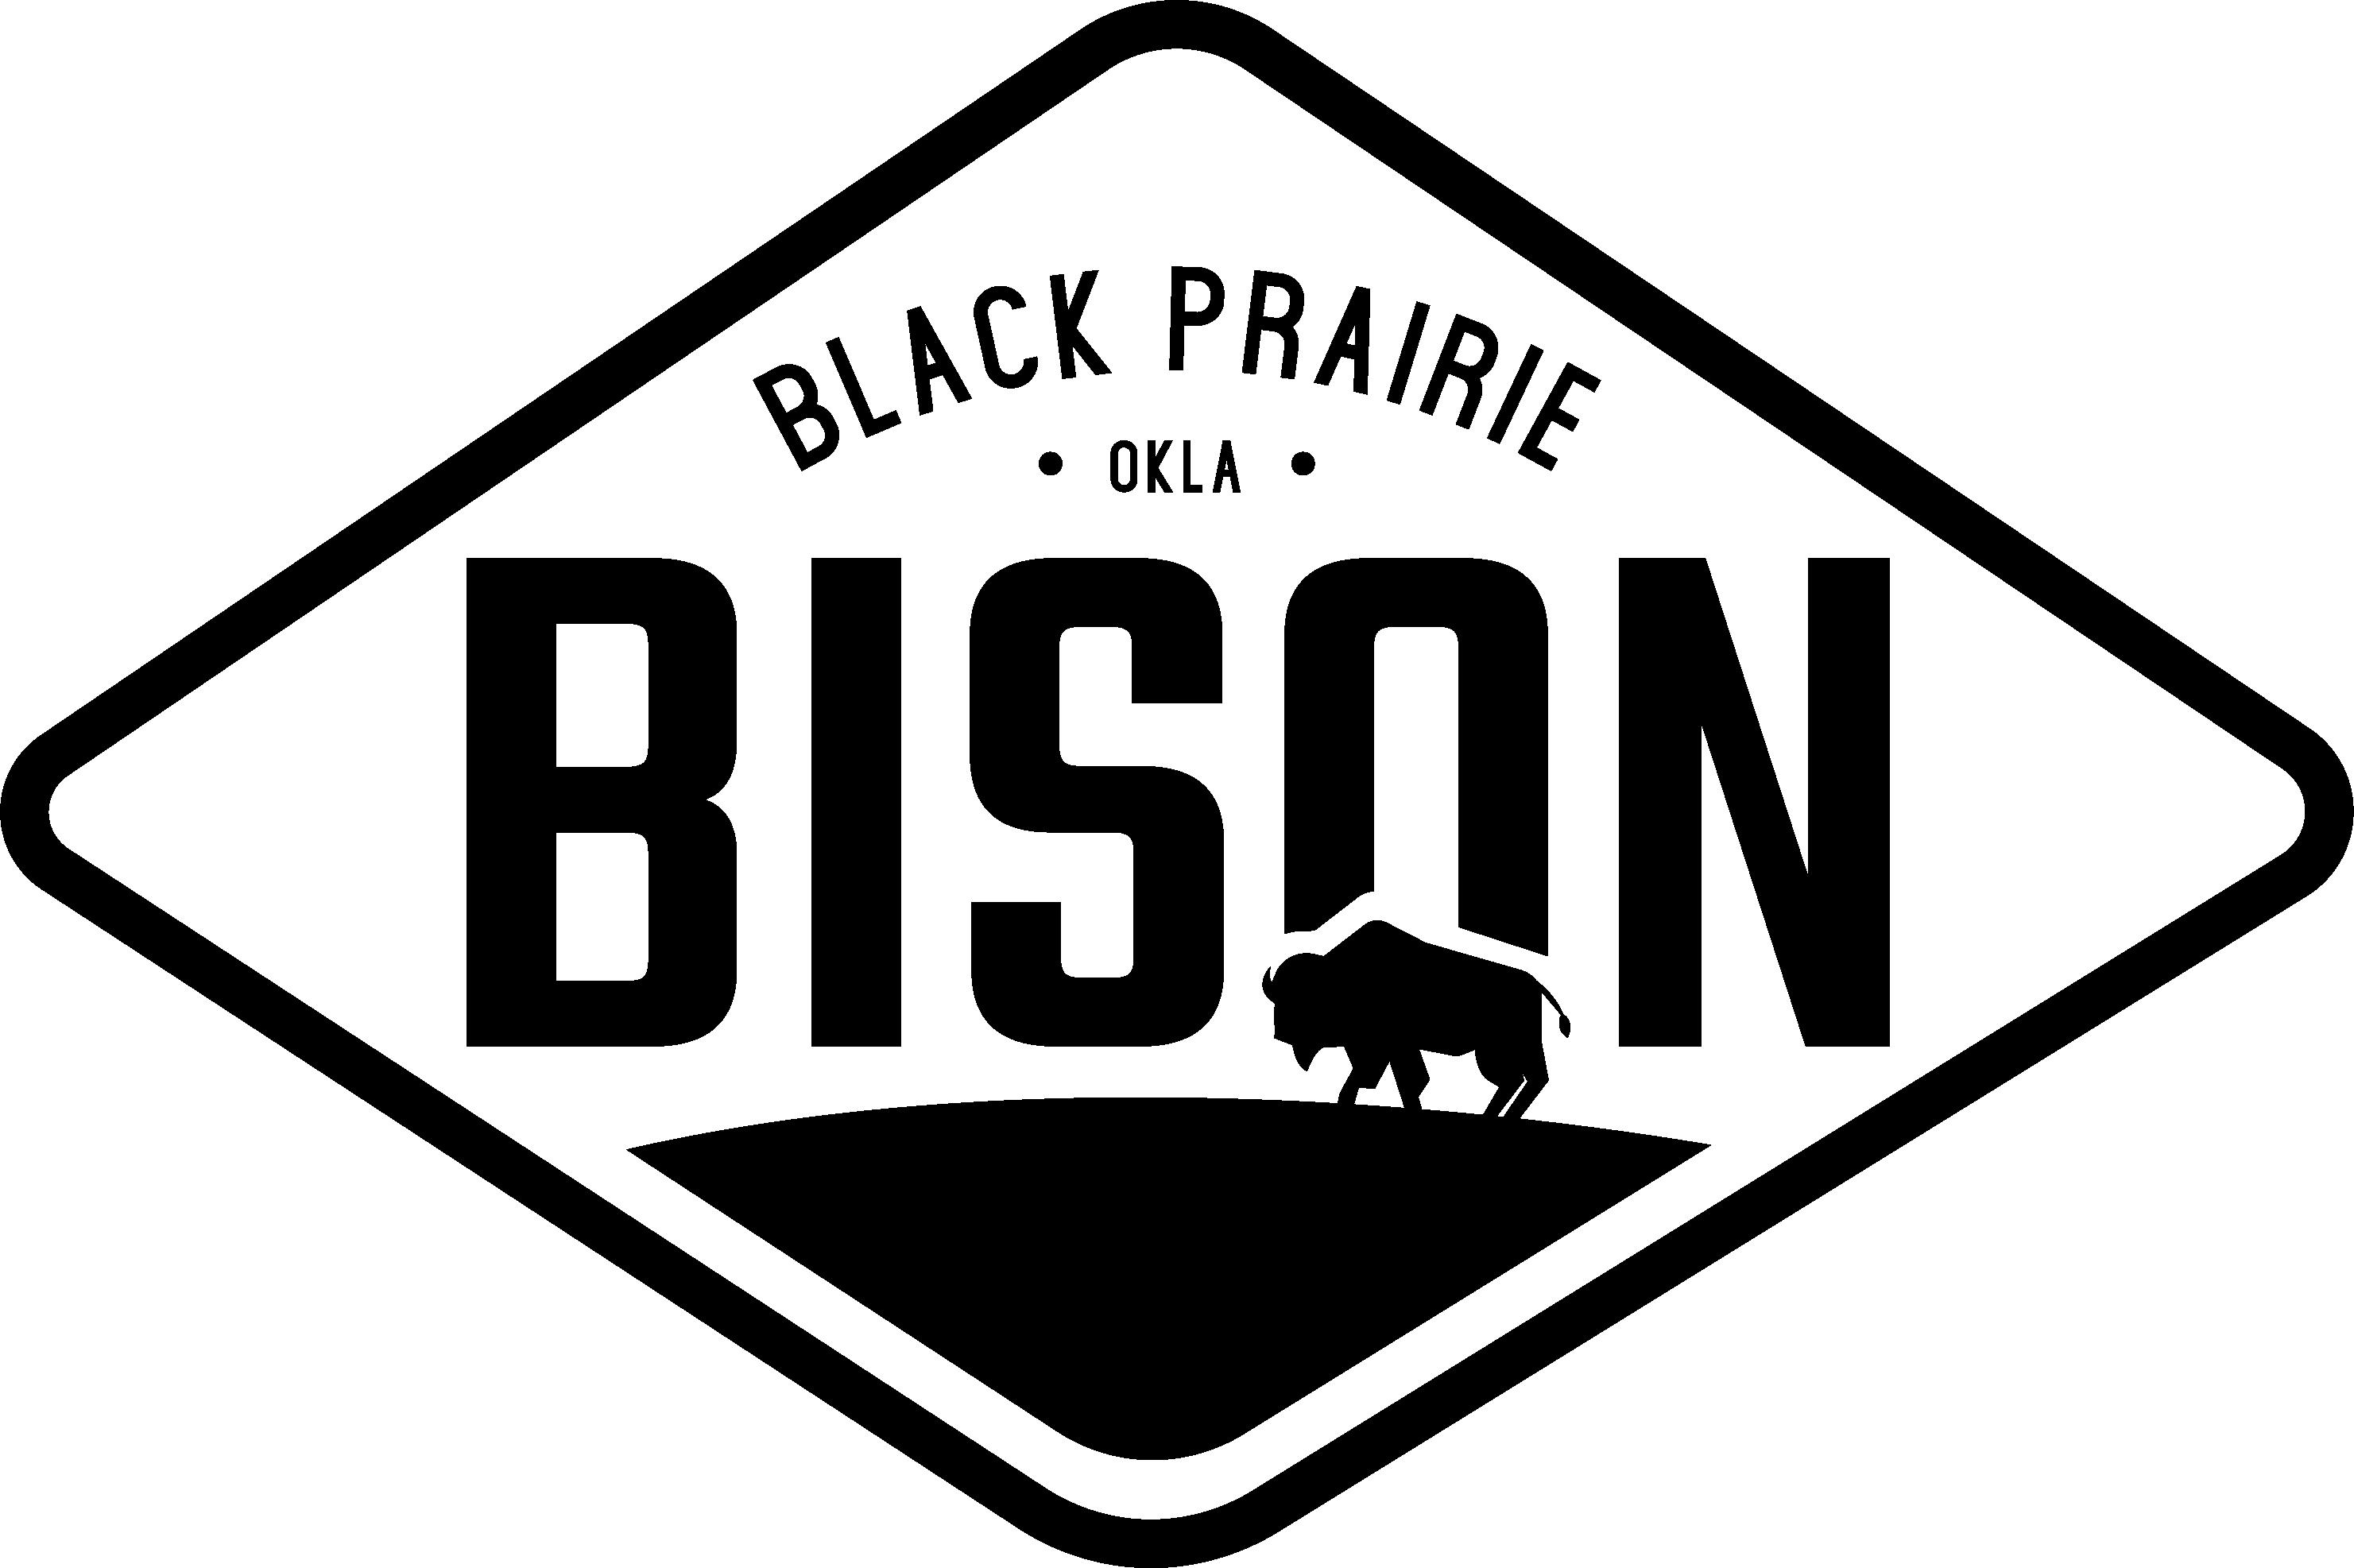 Black Prairie Bison Primary Logo